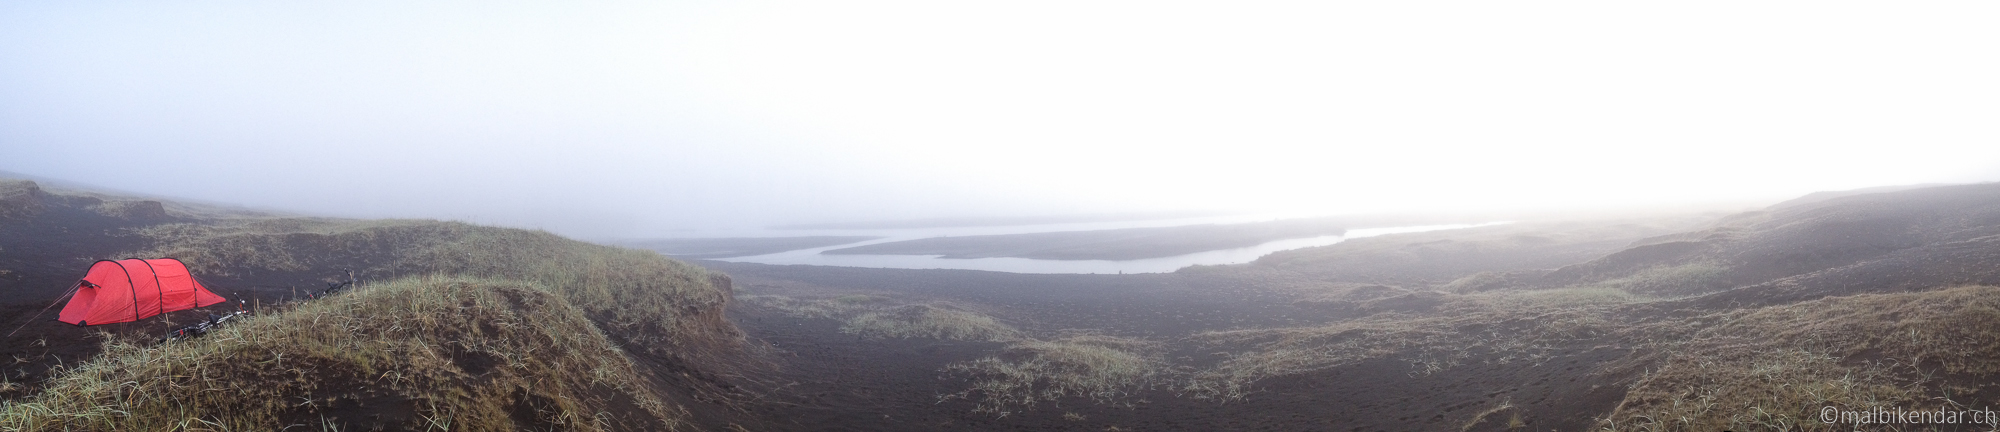 A vélo en islande, le Camp du Brouillard